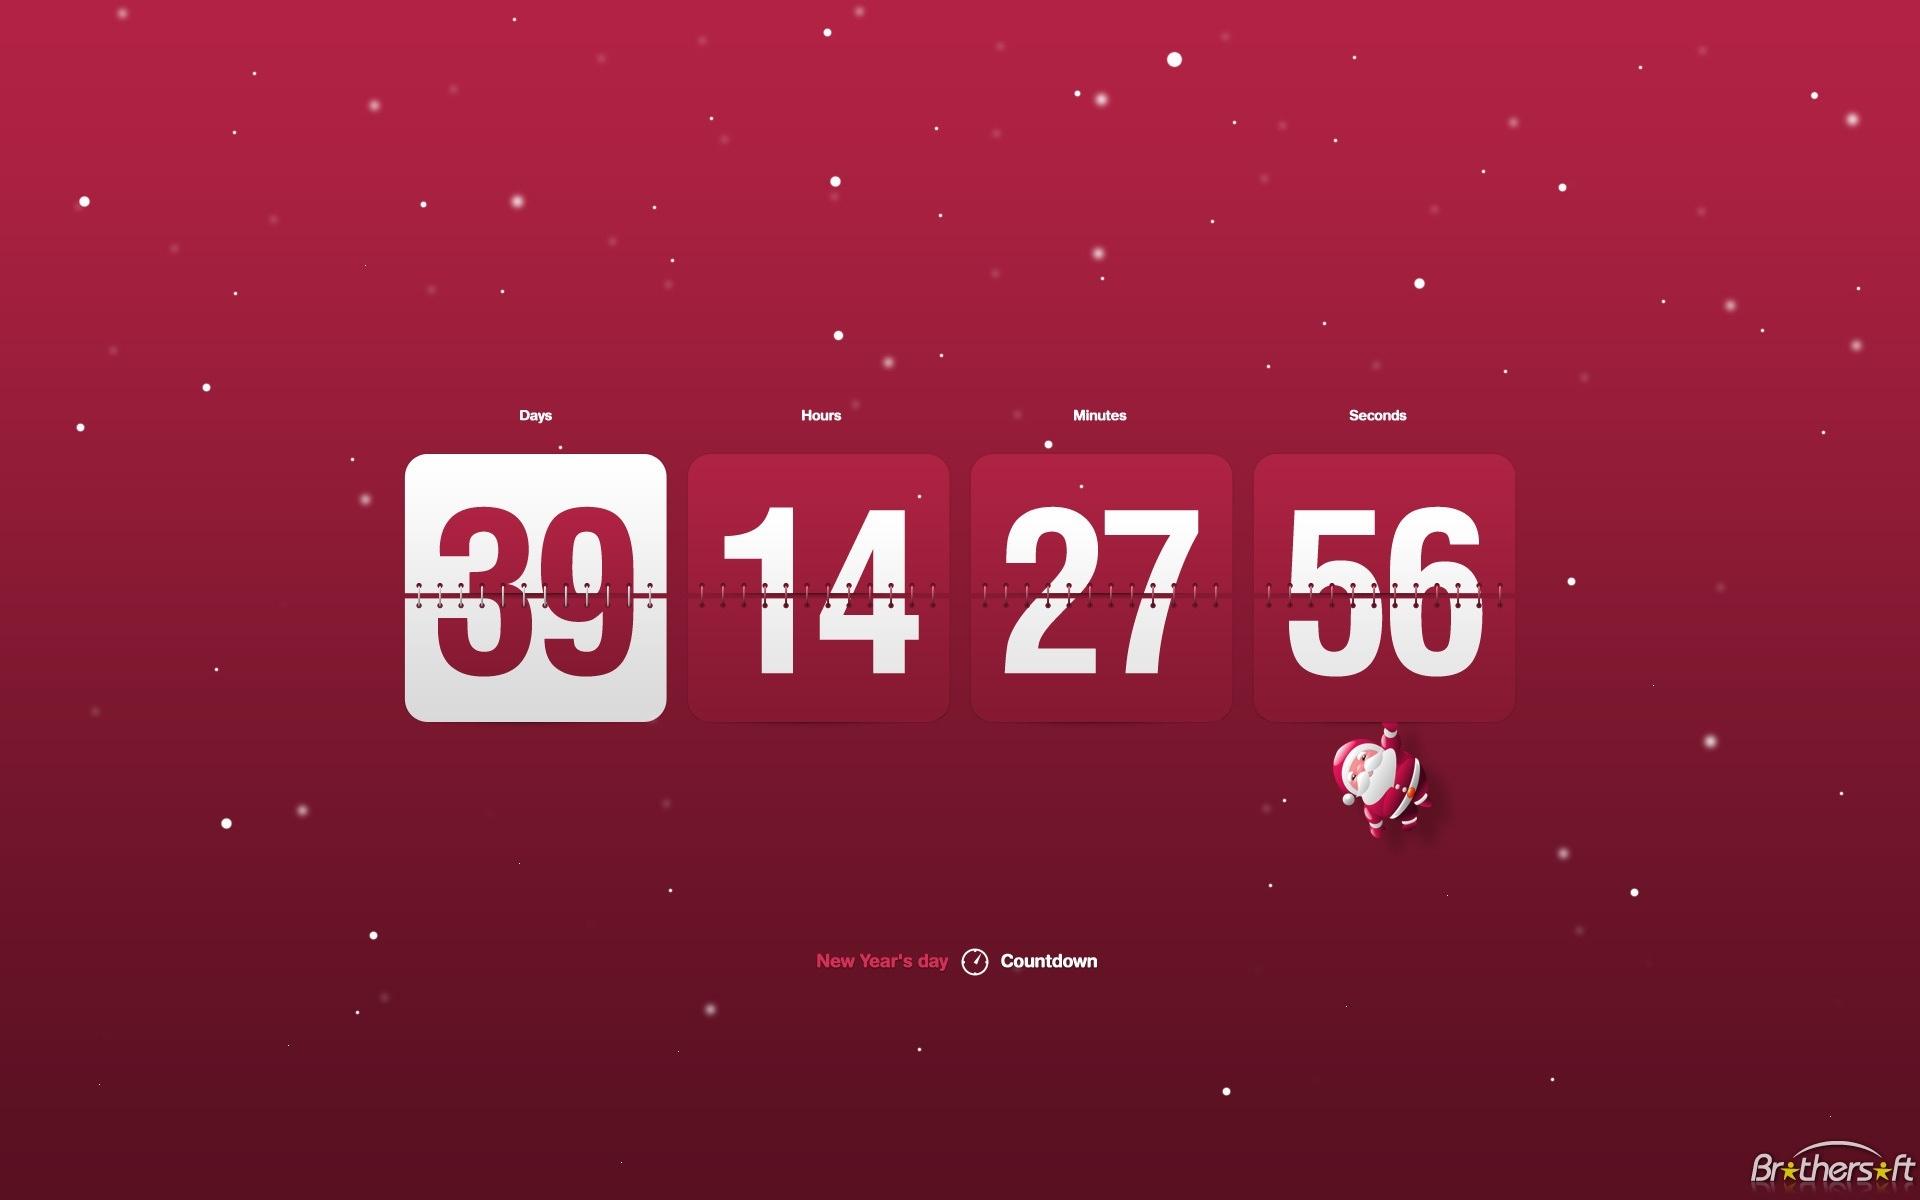 49+] Desktop Wallpaper Countdown Timer On Wallpapersafari_Countdown Calendar To Retirement Desktop